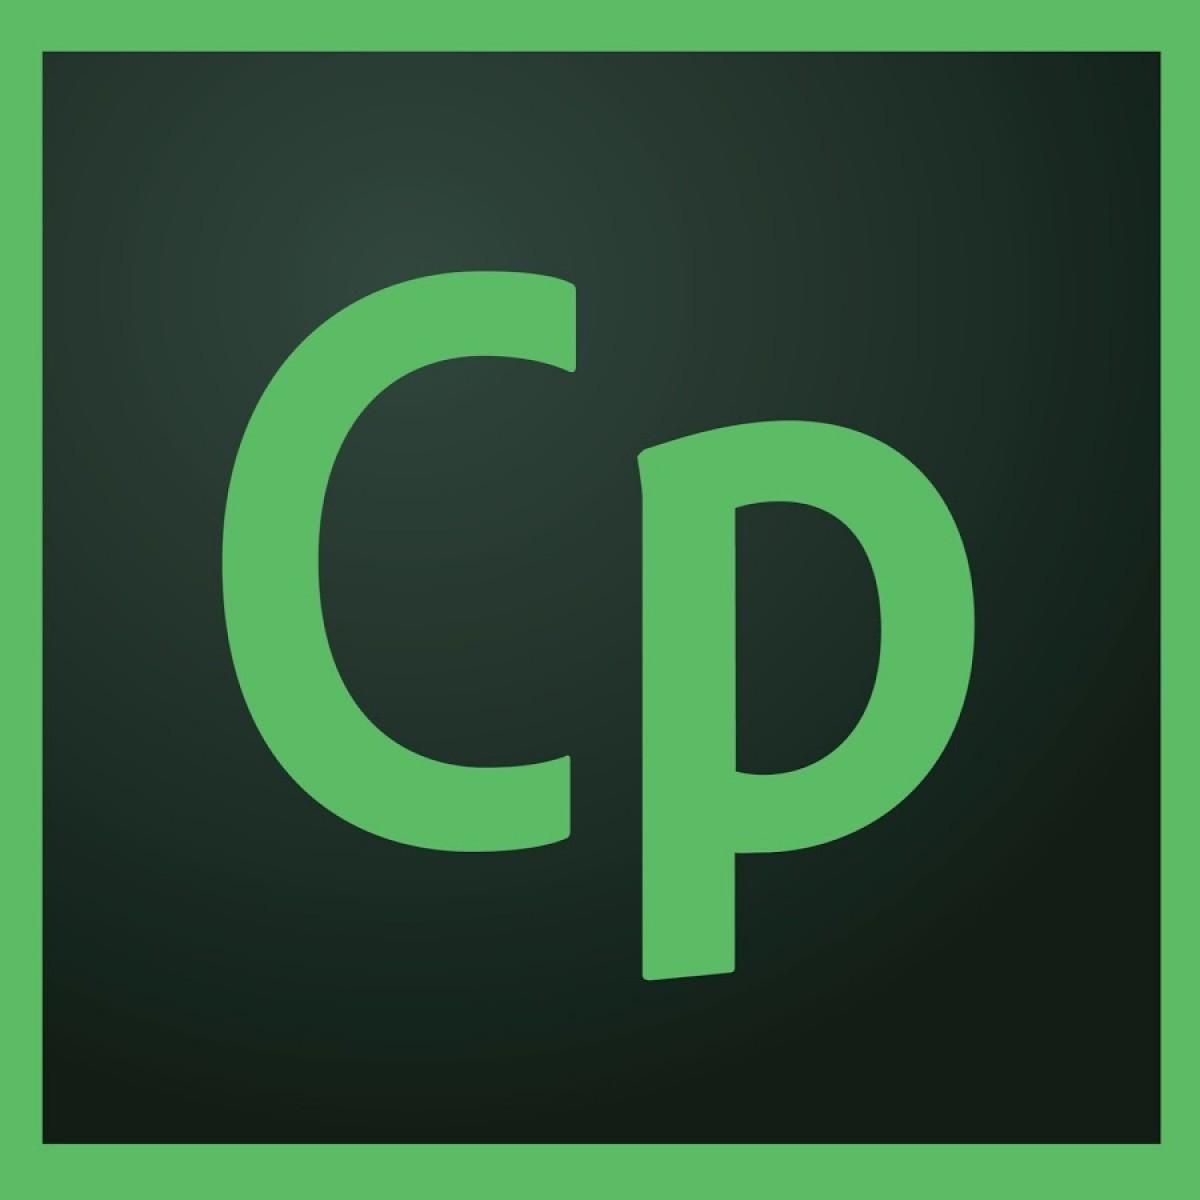 Adobe Captivate постоянная лицензия